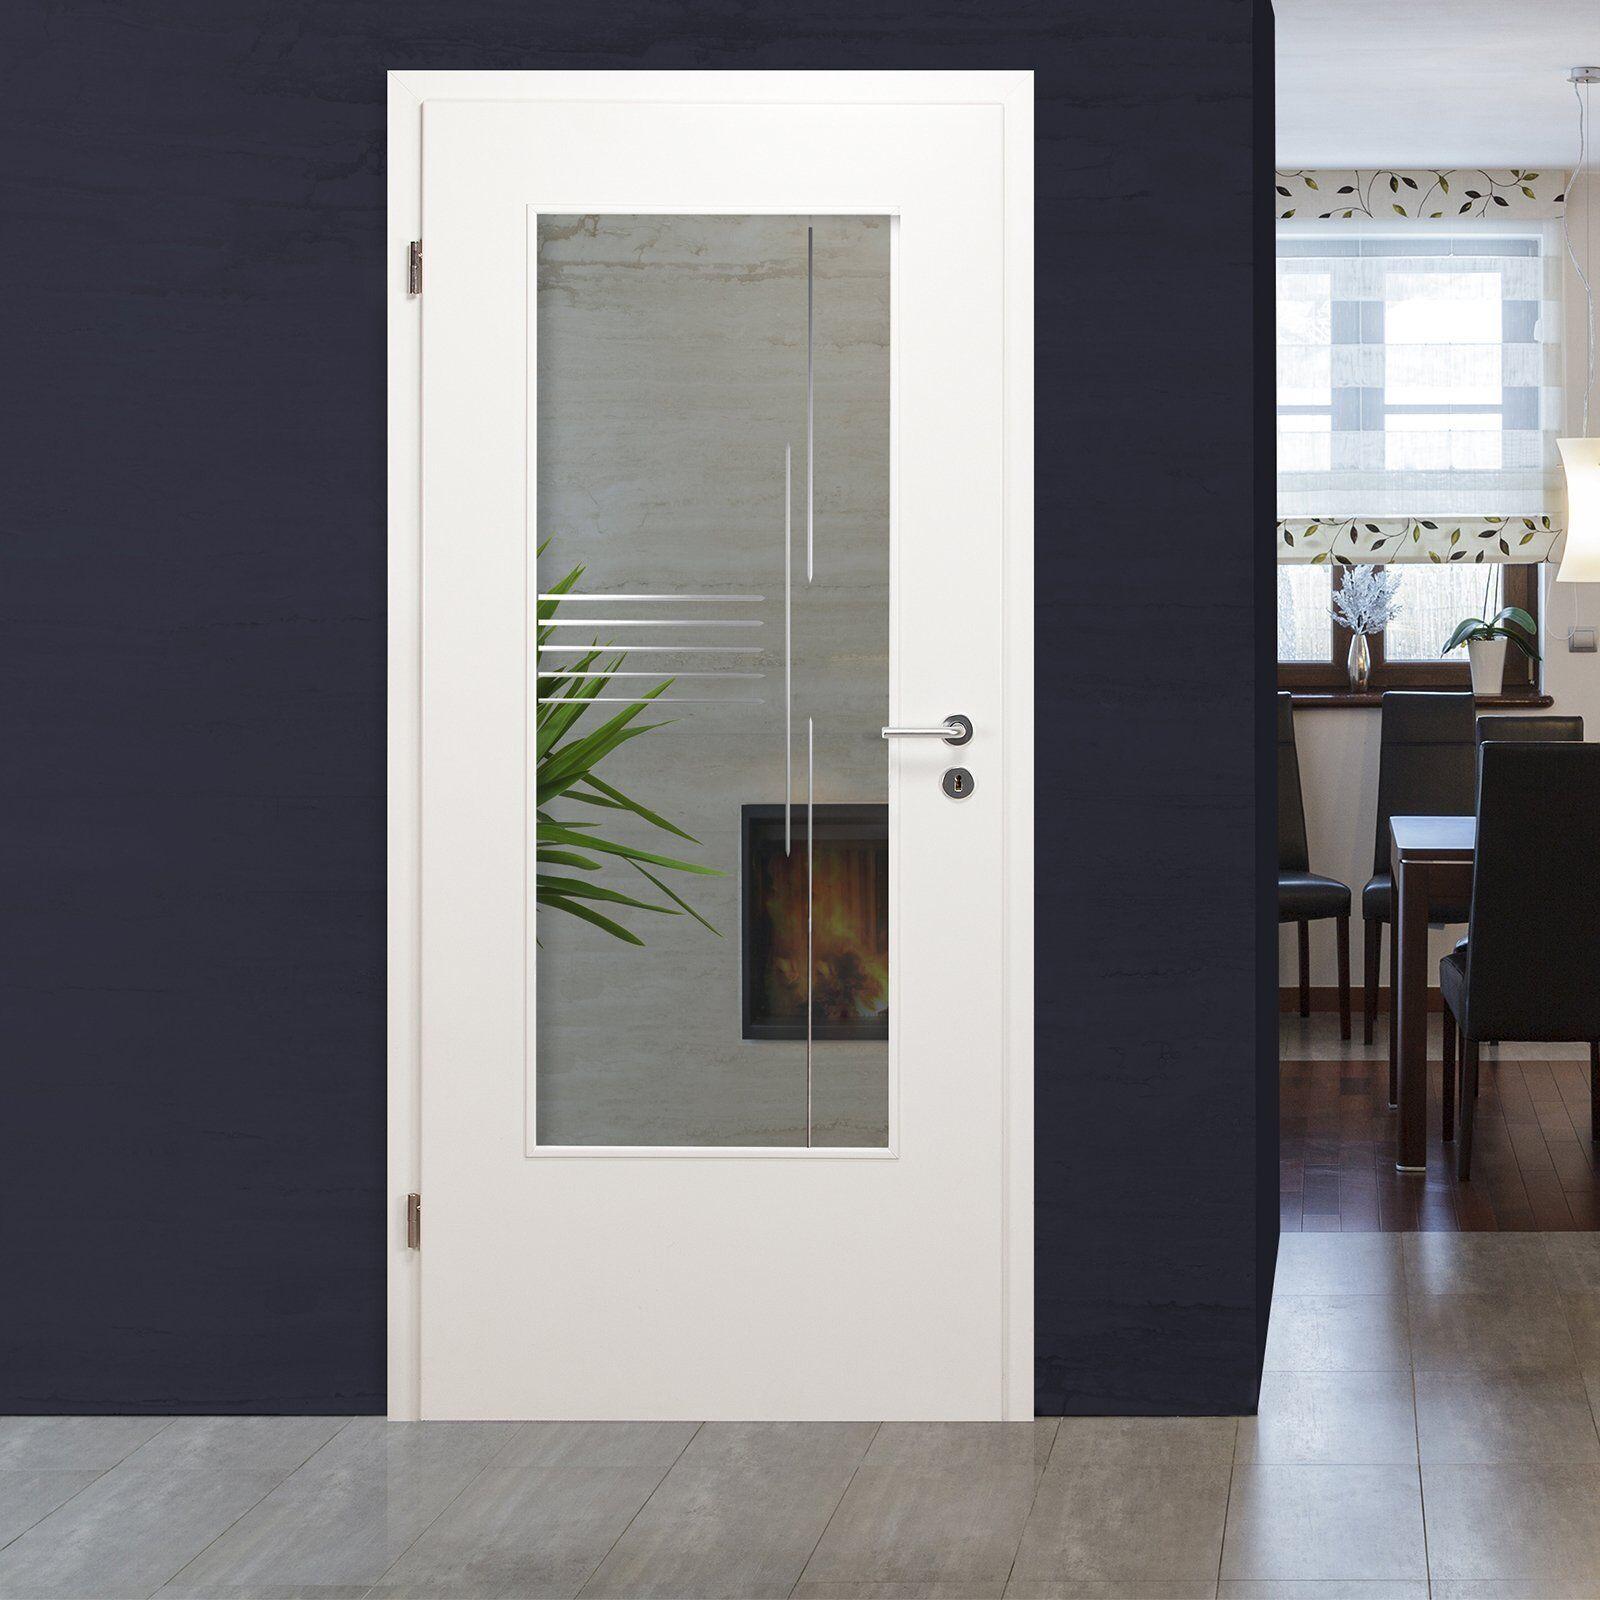 glas art mehr als 100 angebote fotos preise. Black Bedroom Furniture Sets. Home Design Ideas